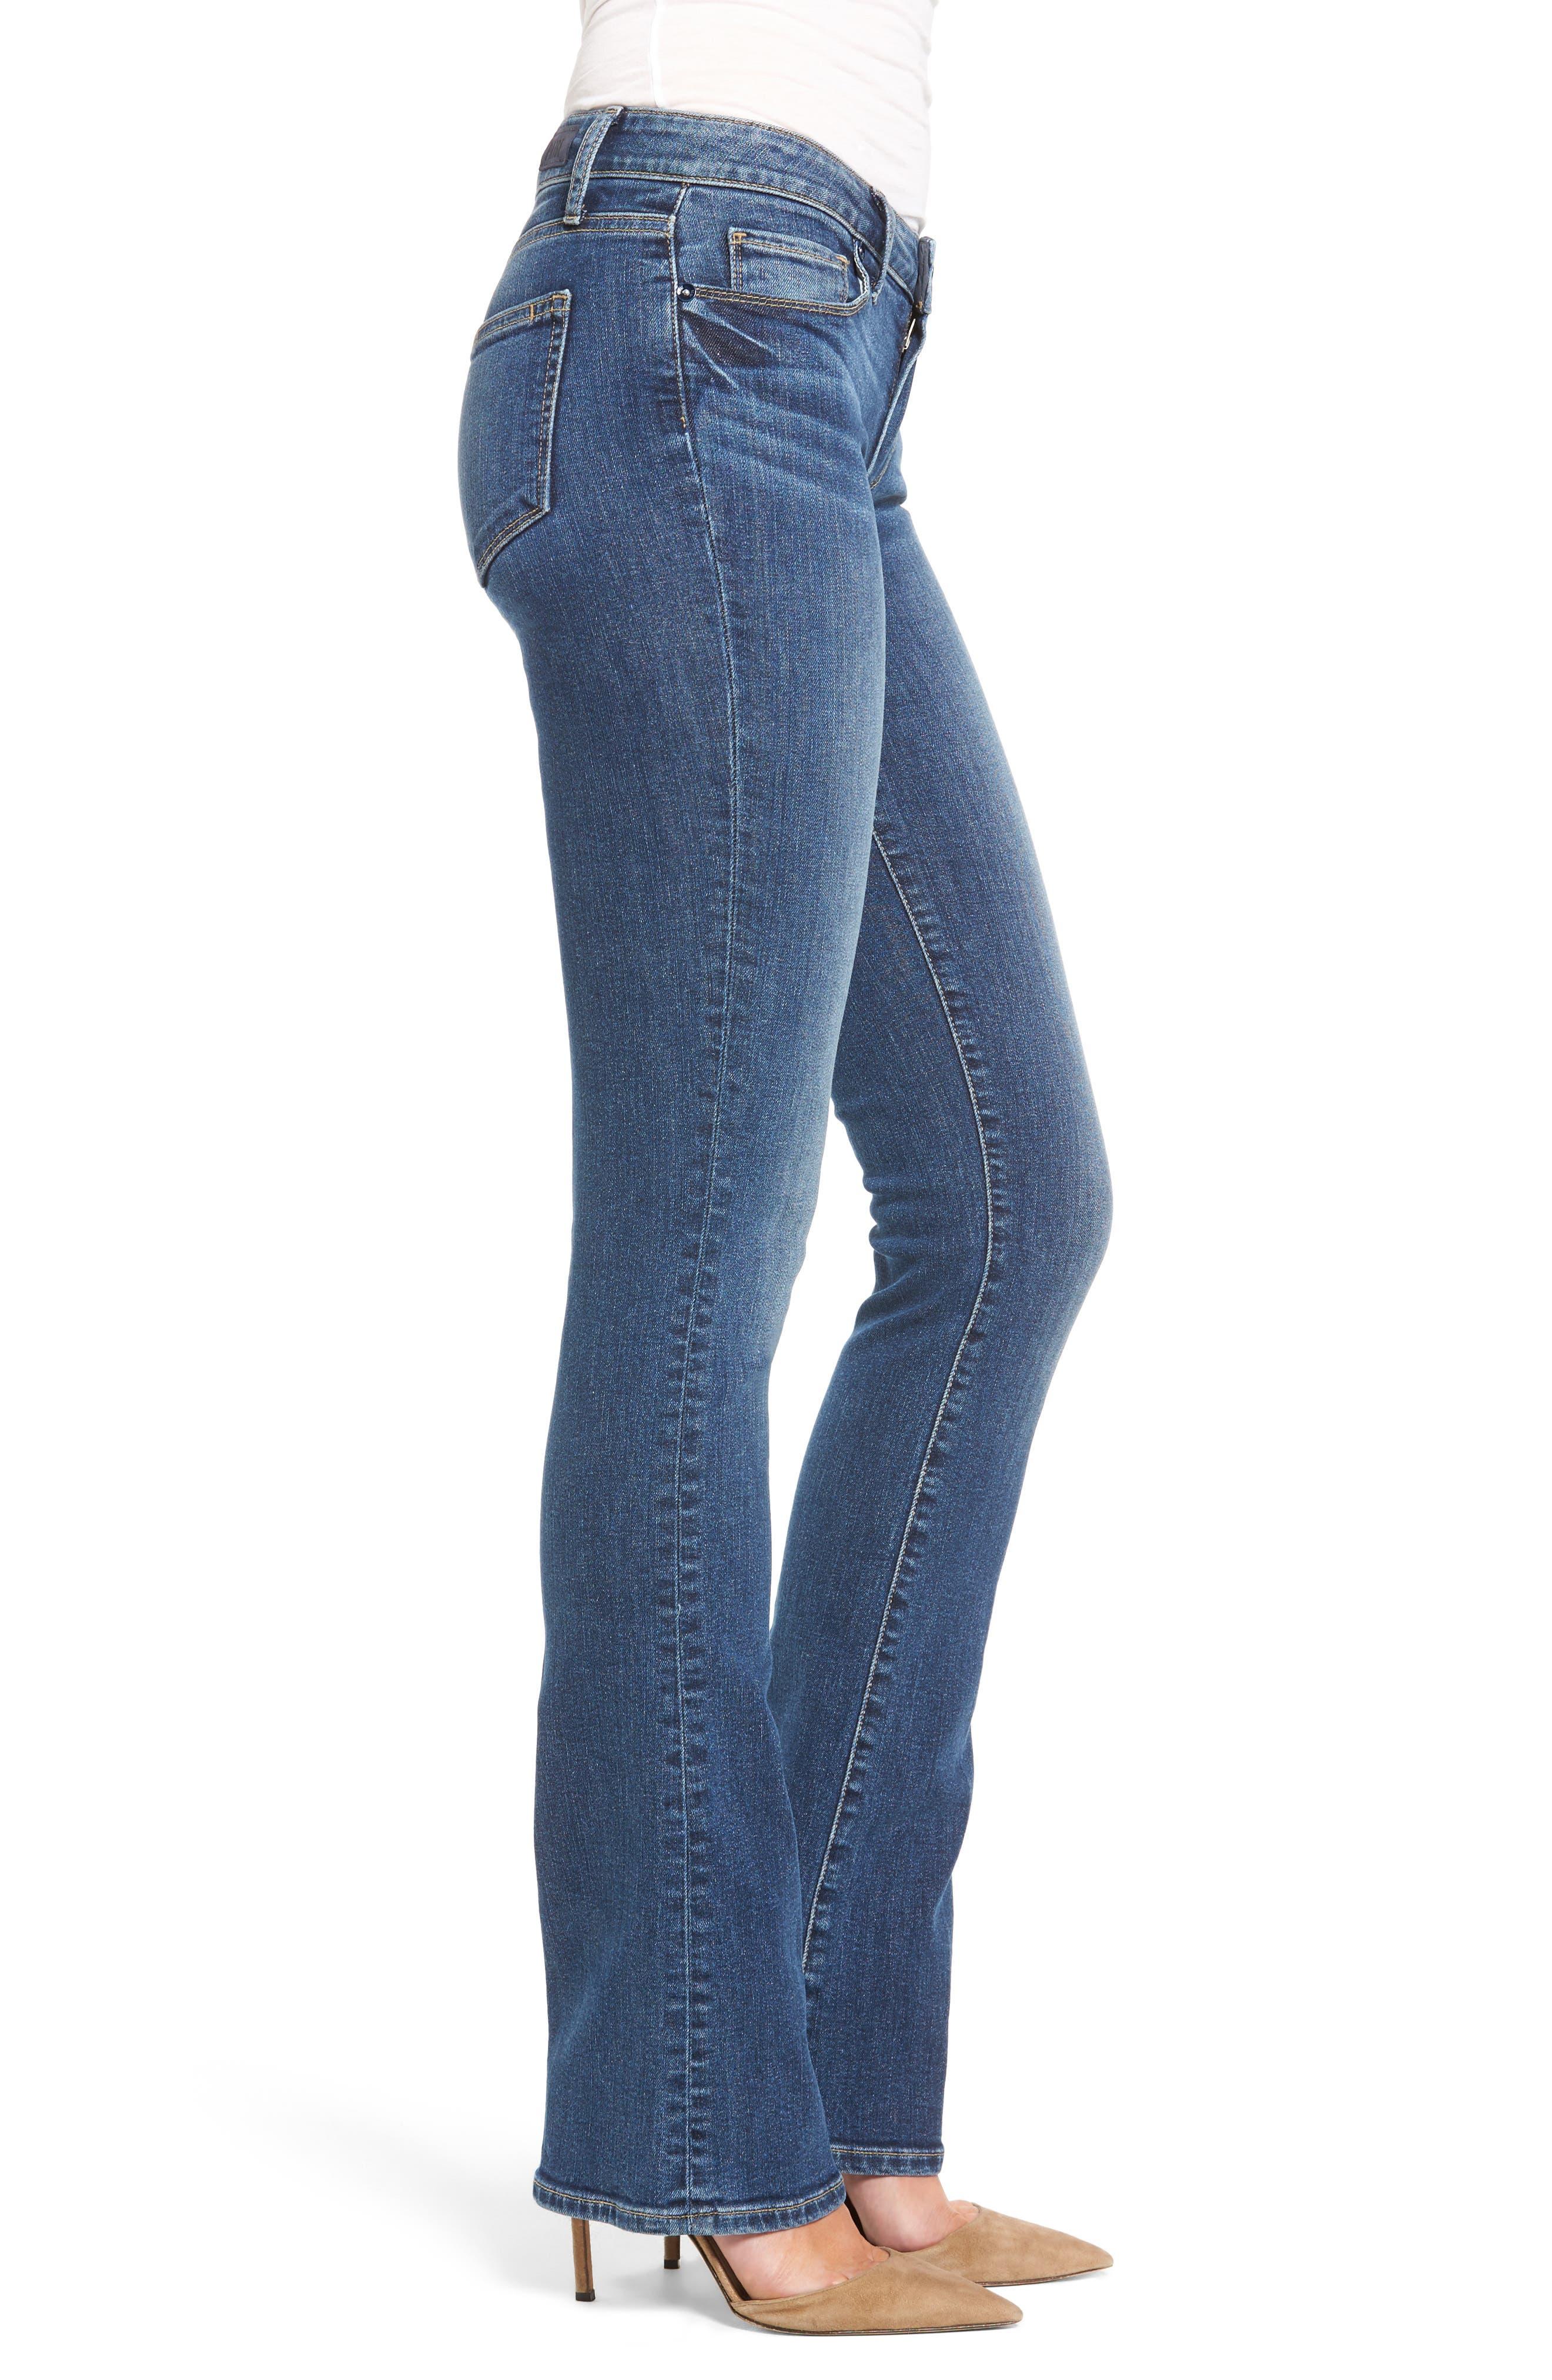 Transcend - Manhattan Bootcut Jeans,                             Alternate thumbnail 3, color,                             400